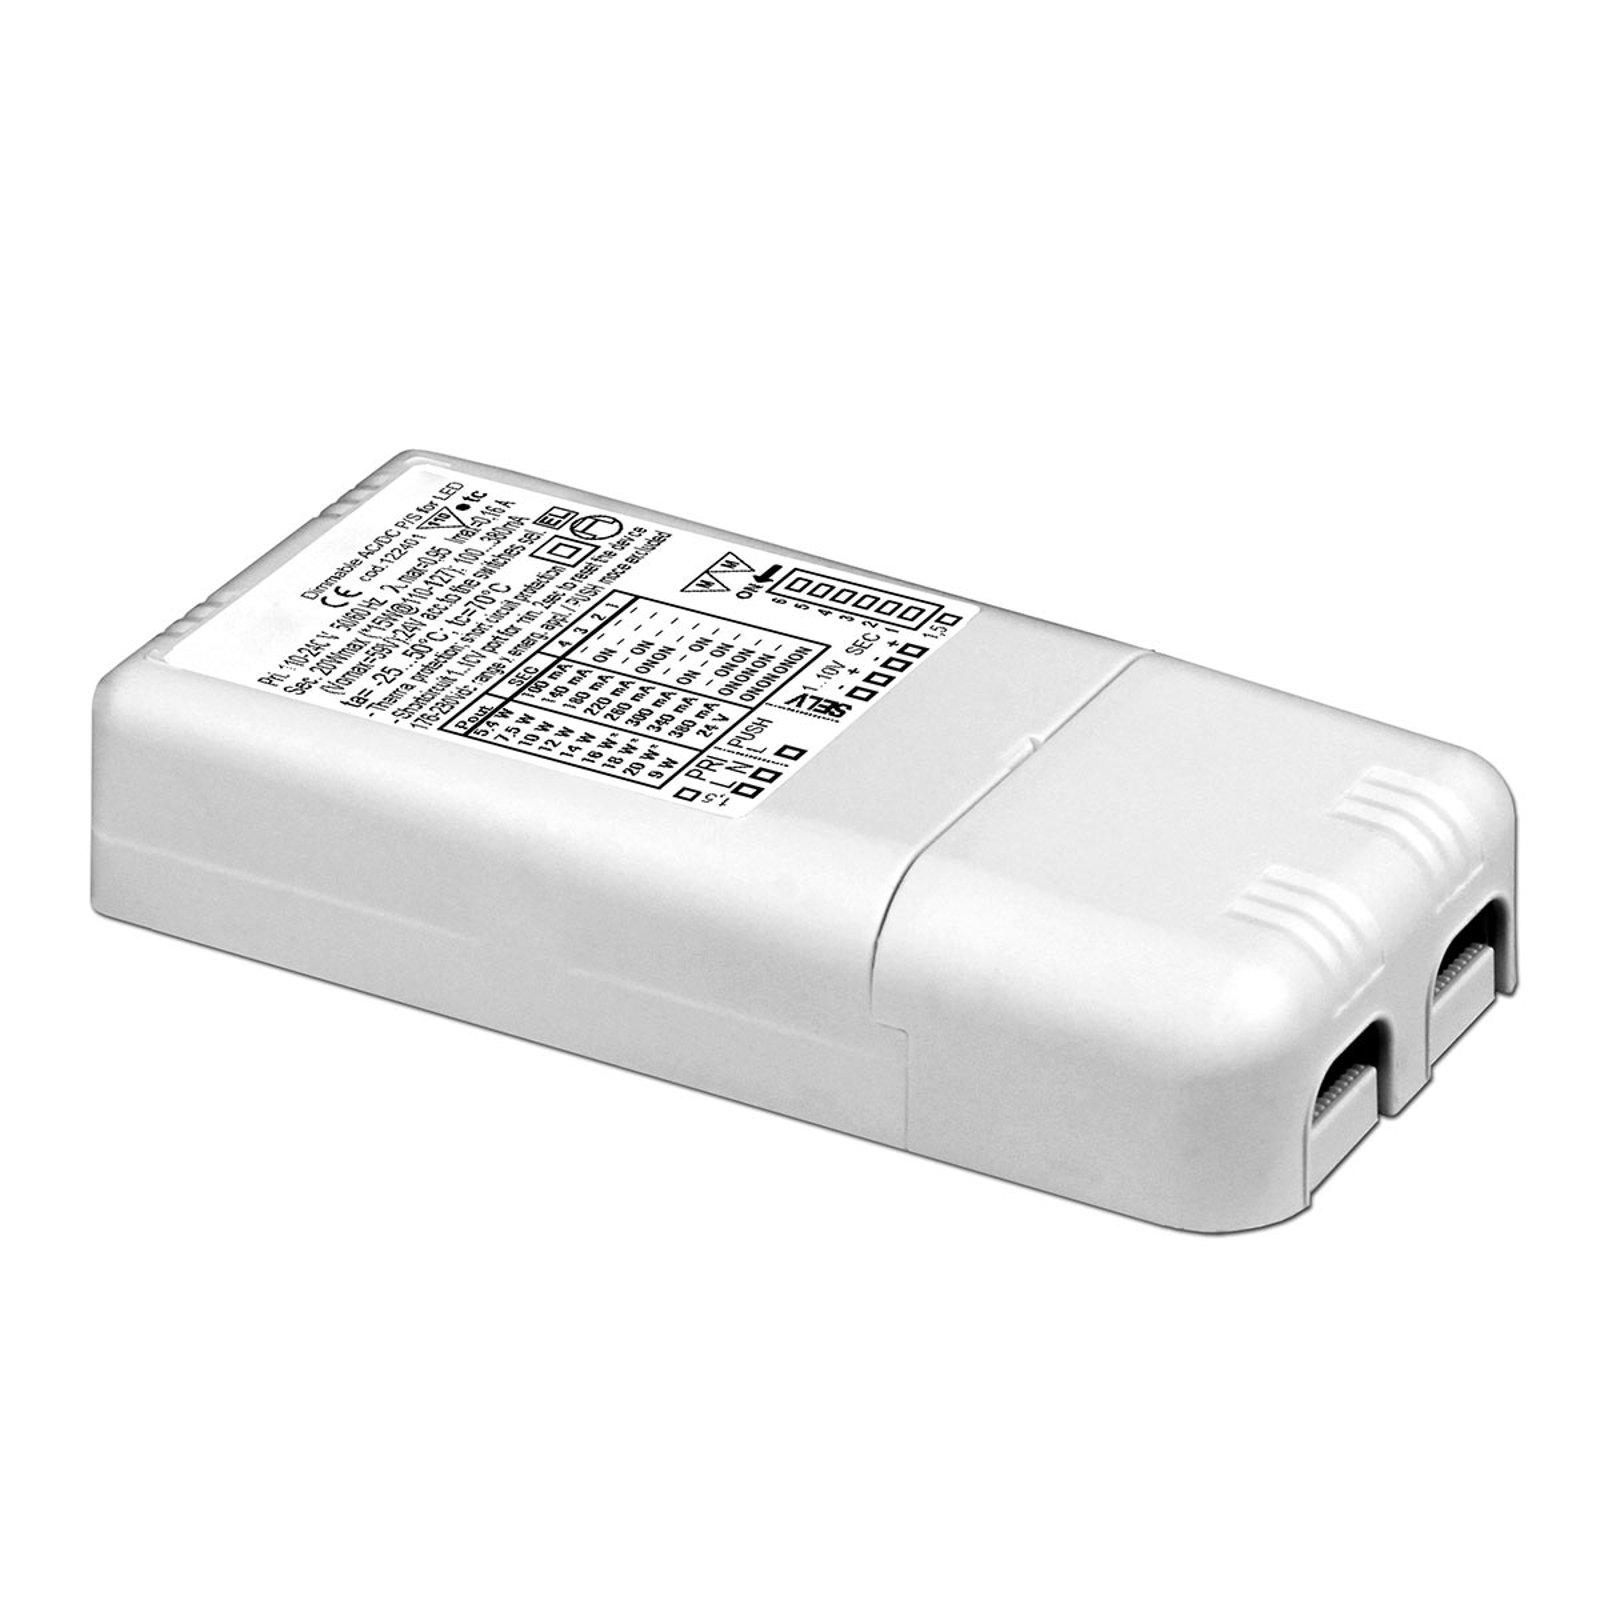 Universal-LED-konverter, justerbar, ikke dimbar